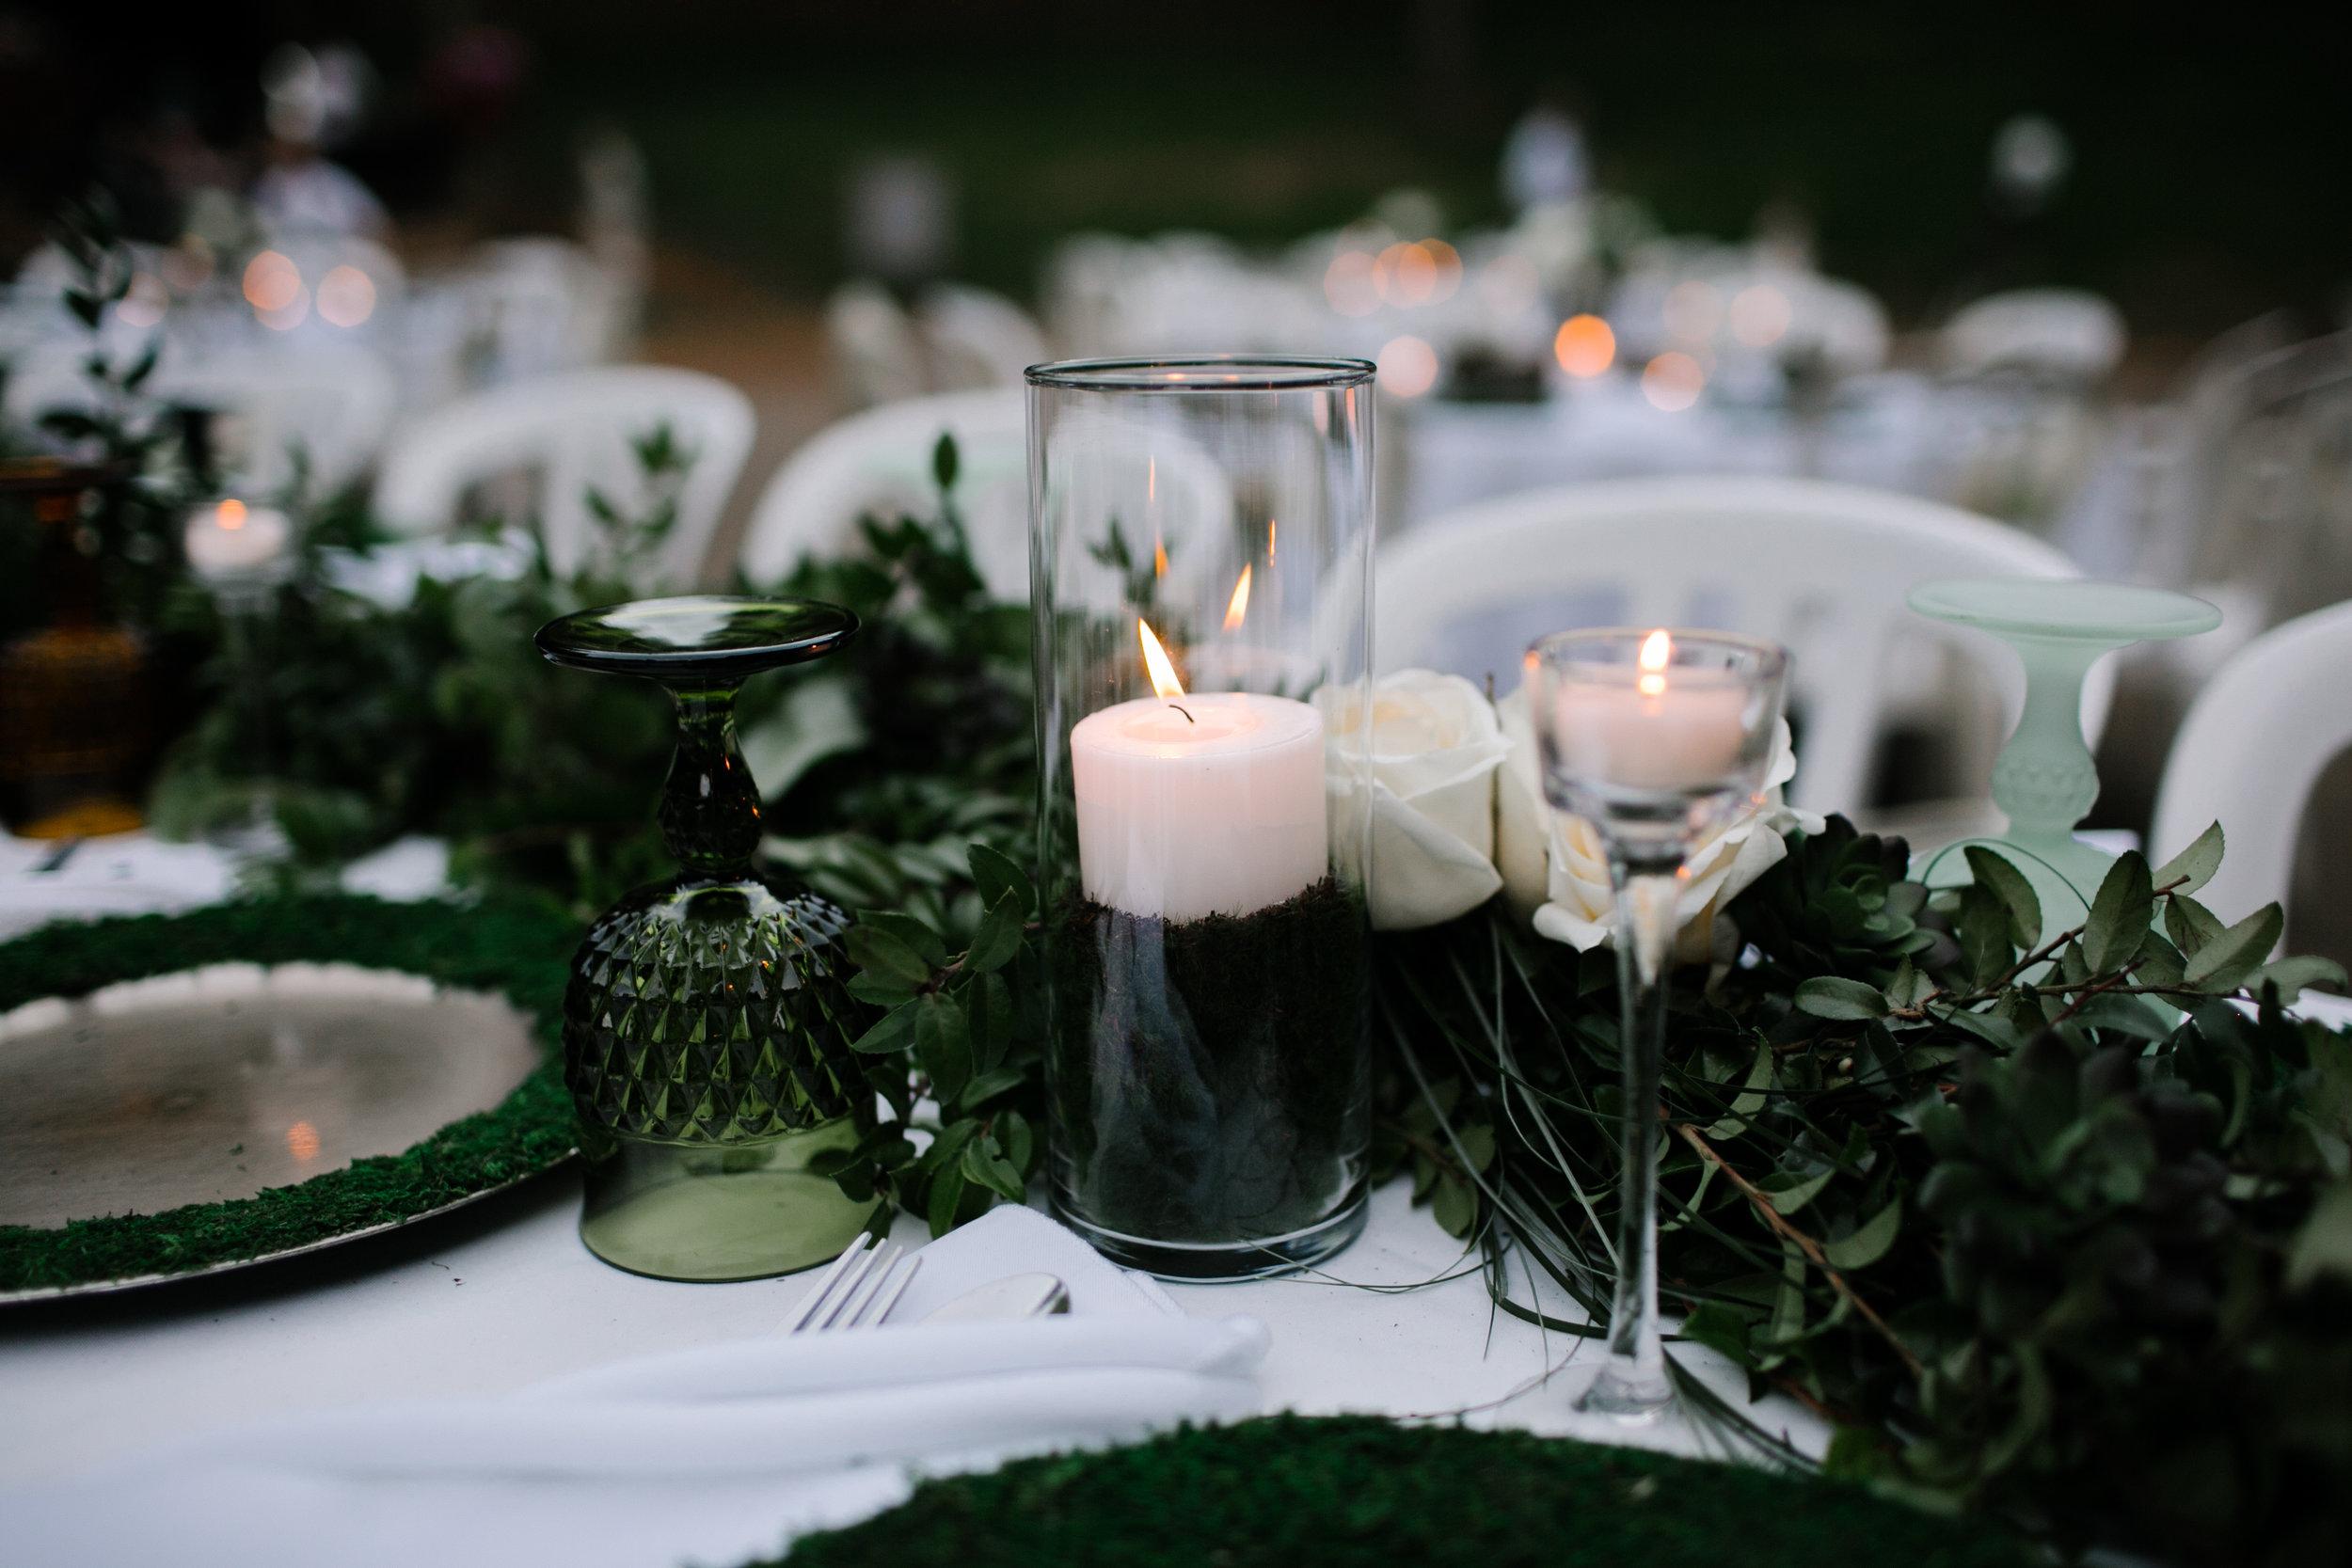 Sevlynn-Photography-Teresa-Chandler-Wedding-61.jpg